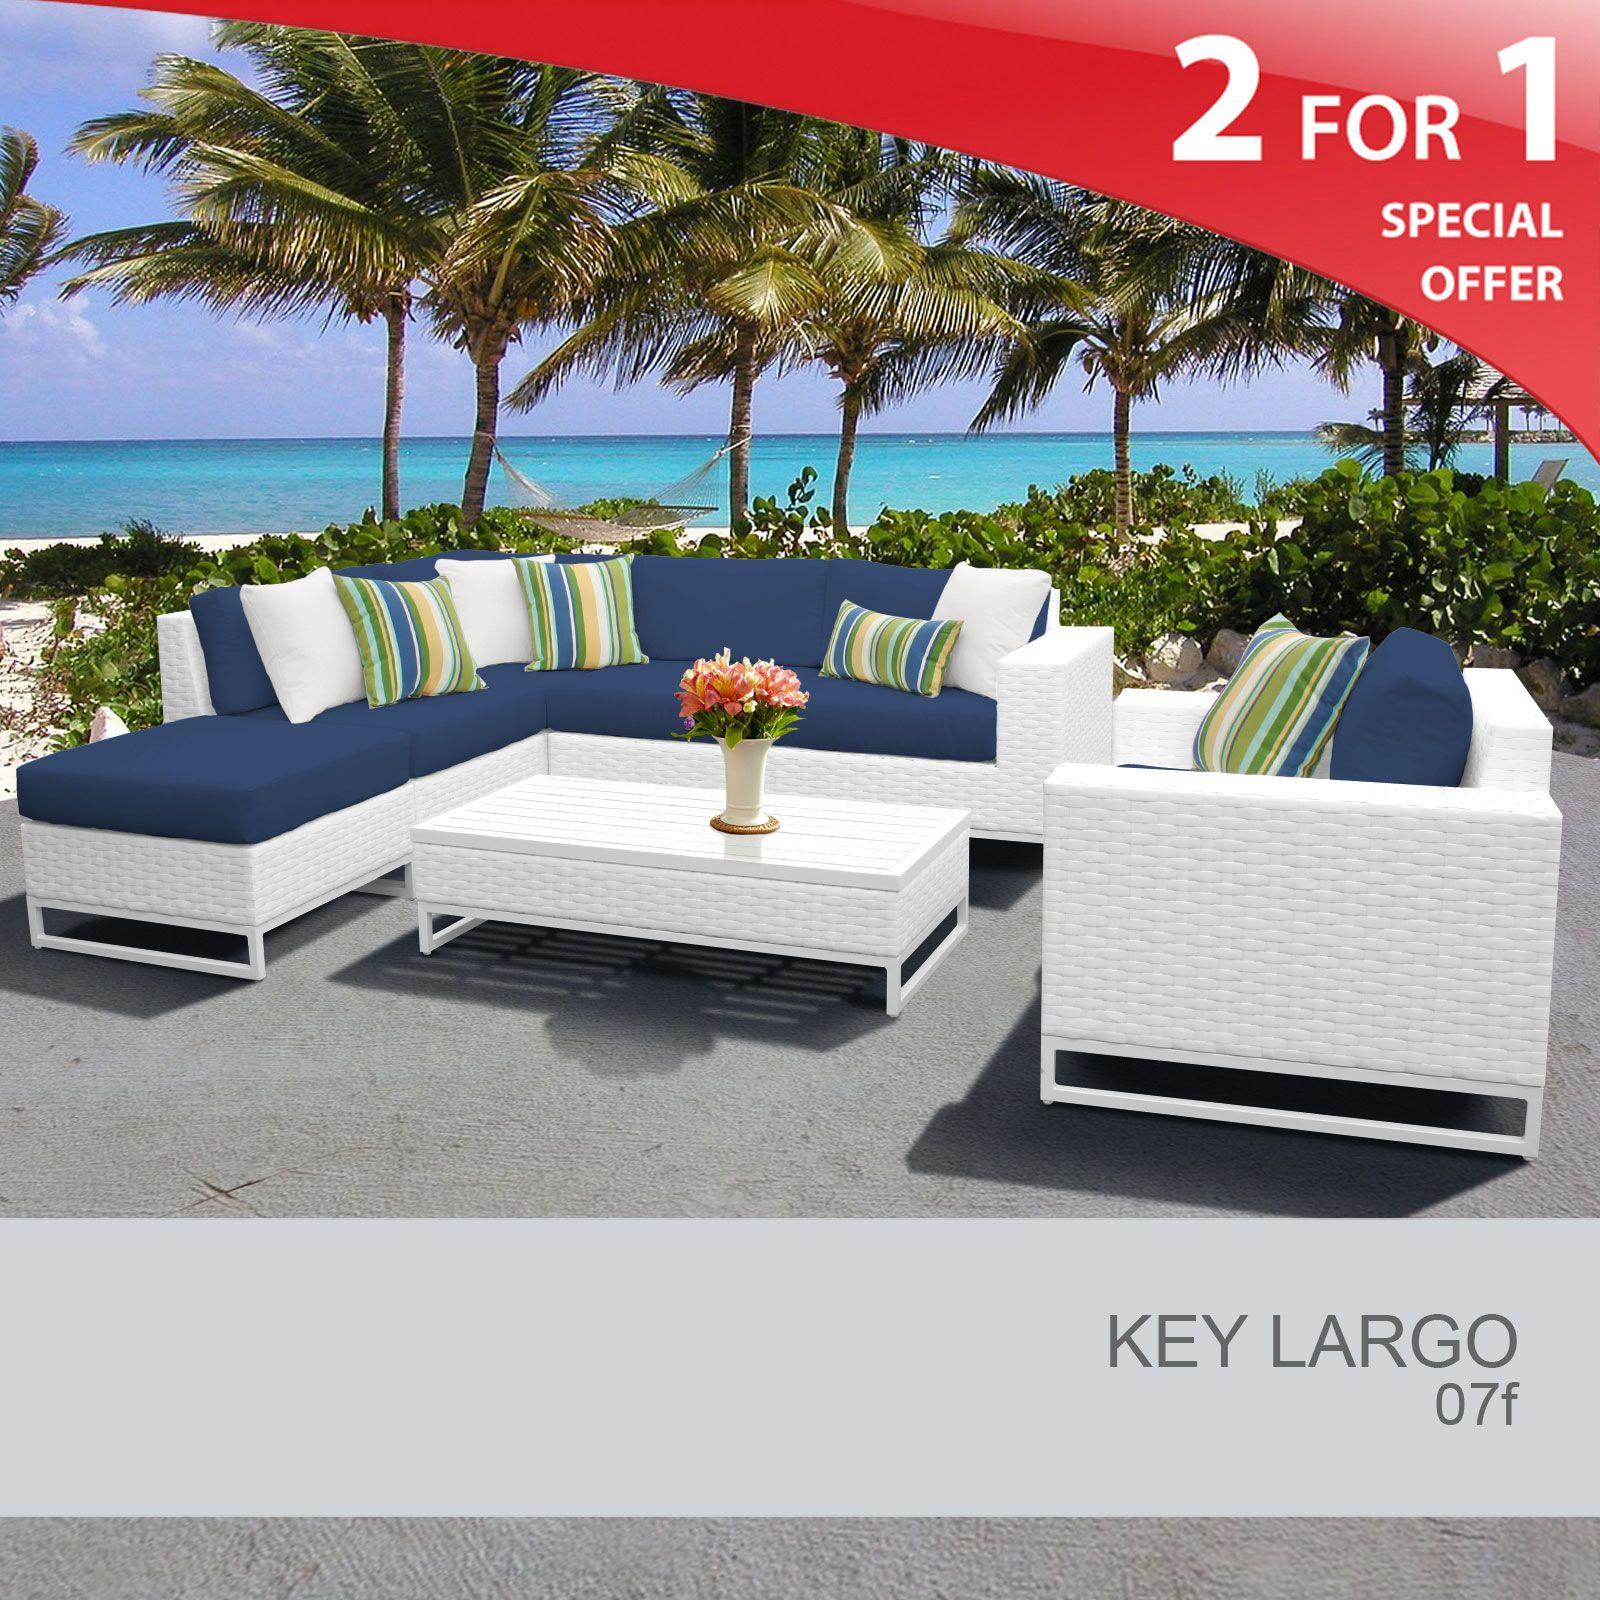 Key Largo 7 Piece Outdoor Wicker Patio Furniture Set 07f Design